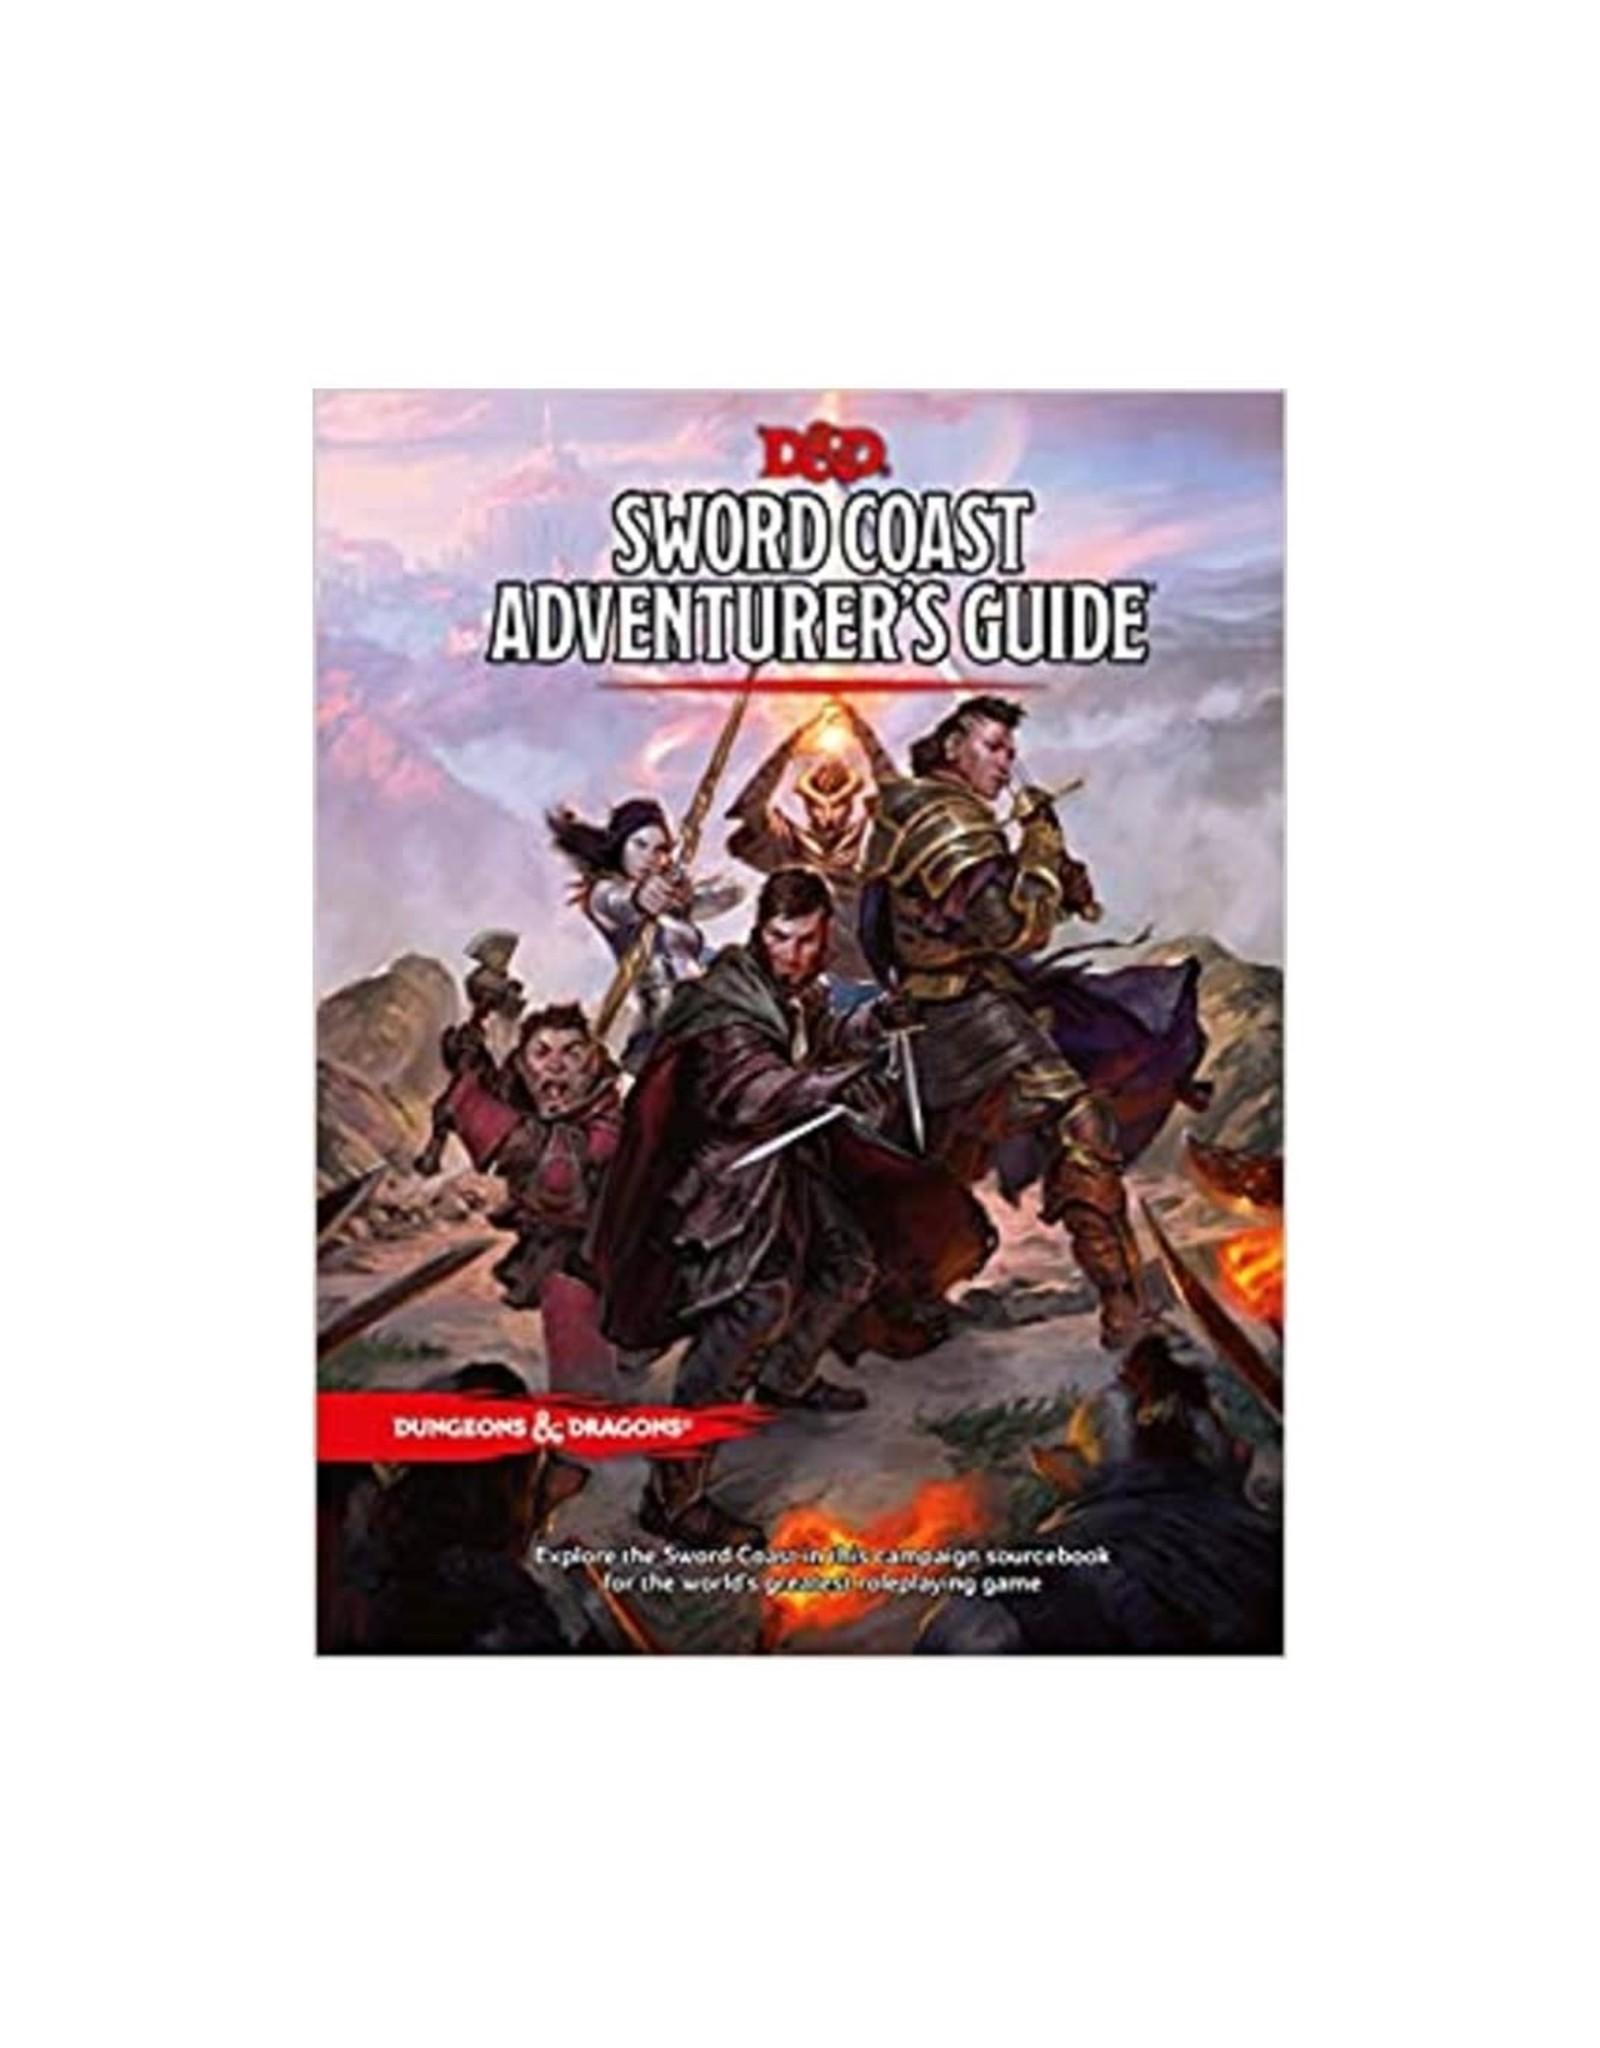 Dungeons & Dragons D&D Sword Coast Adventurers Guide